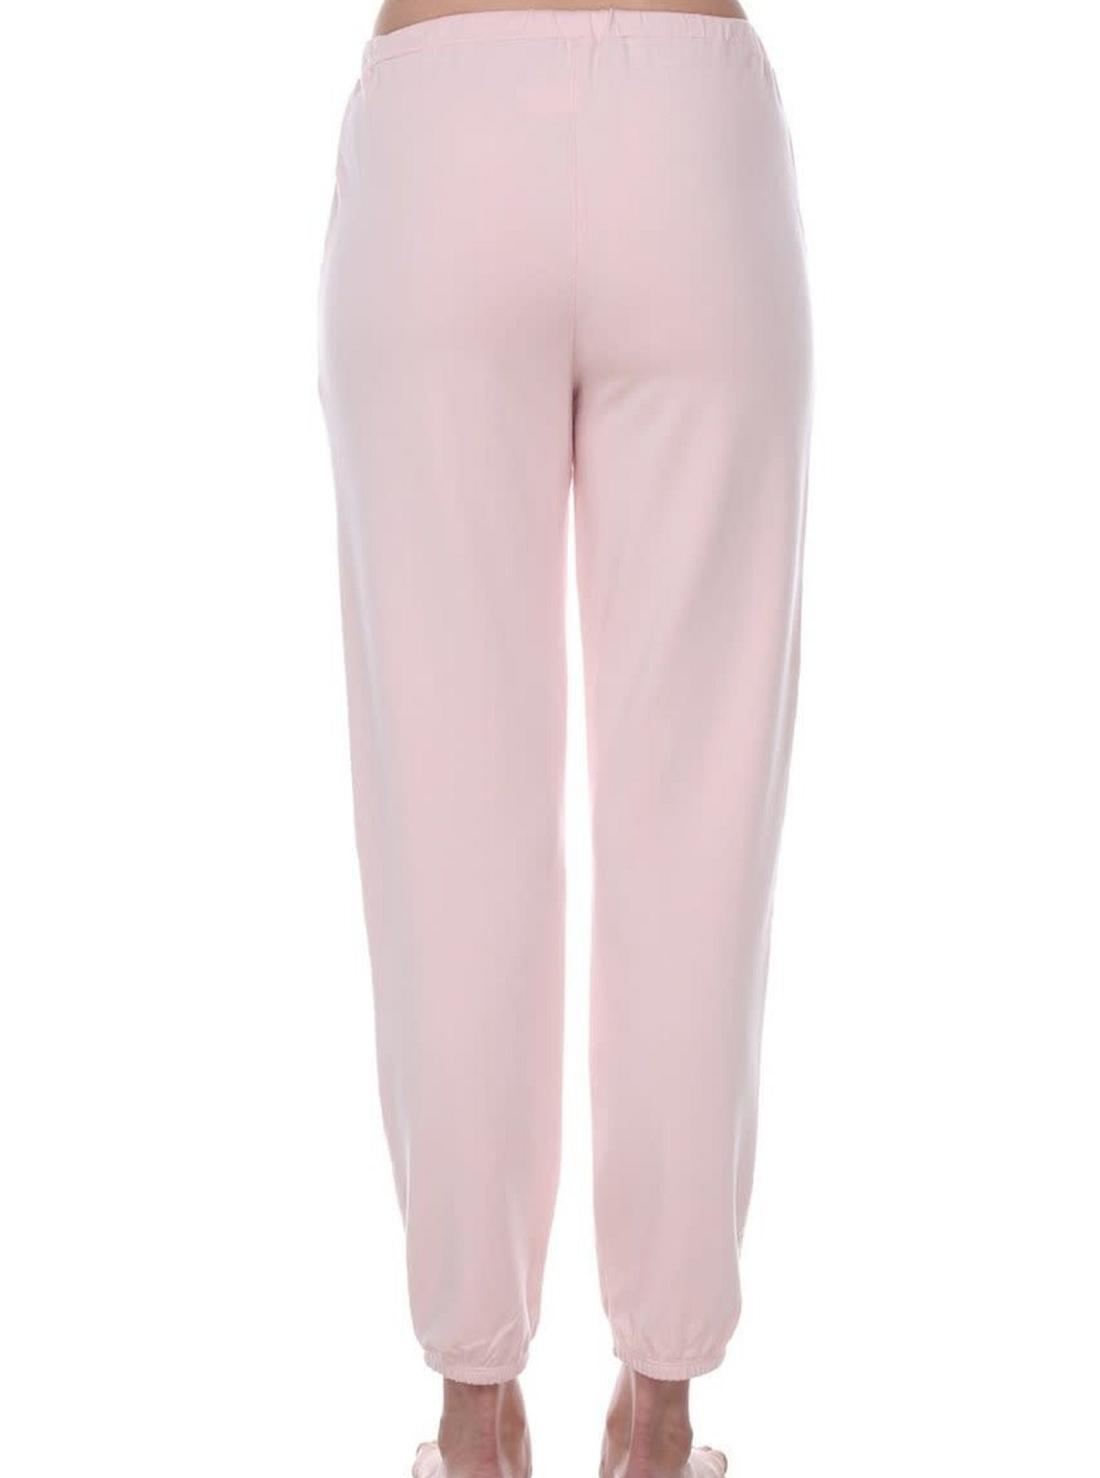 Wholesale Women's Sweat Jogger Pants